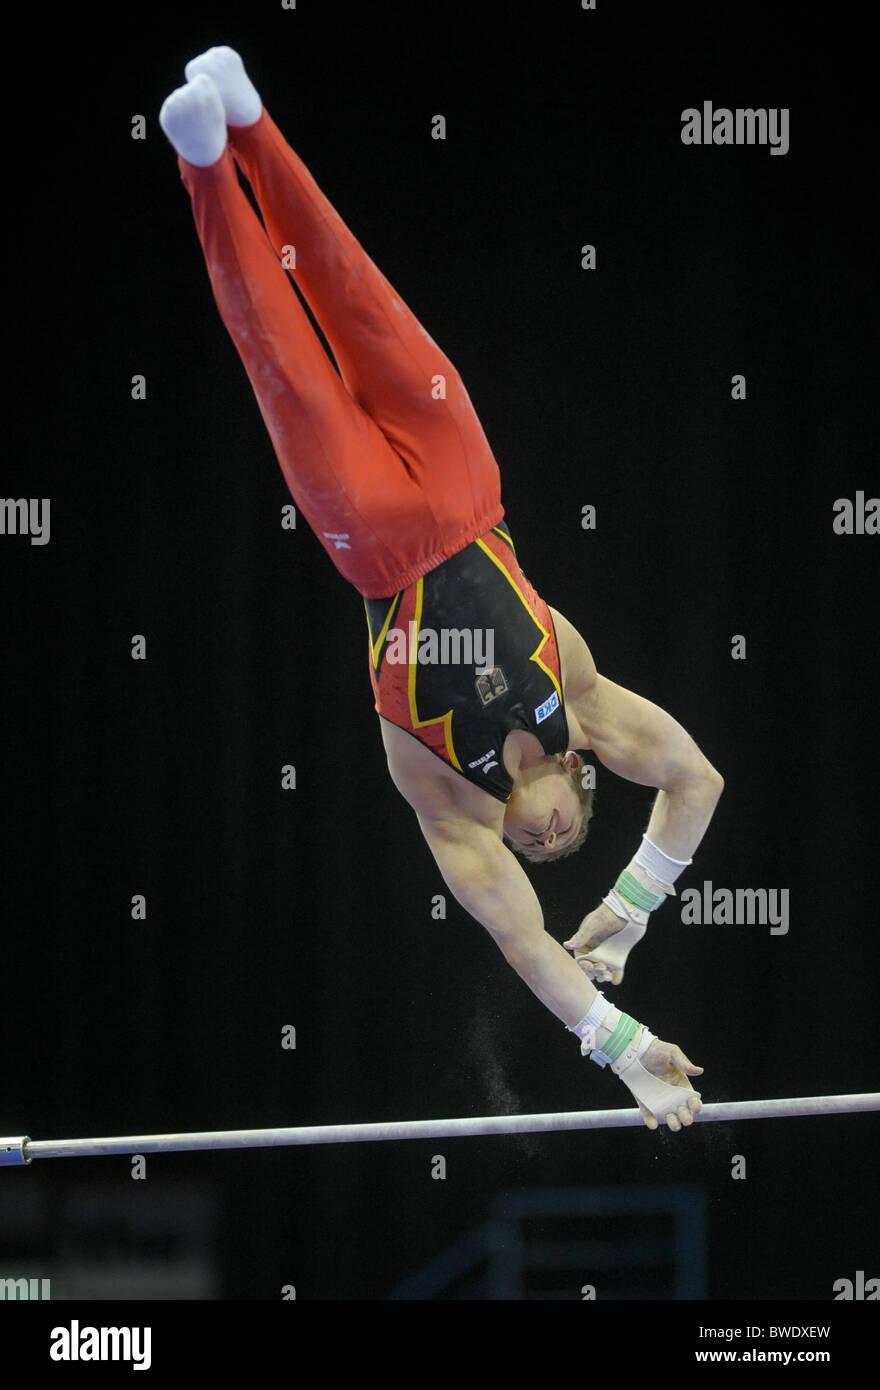 European Gymnastic Championships 2010.Birmingham NIA. Mens Podium Training. Photos by Alan EDwards - Stock Image